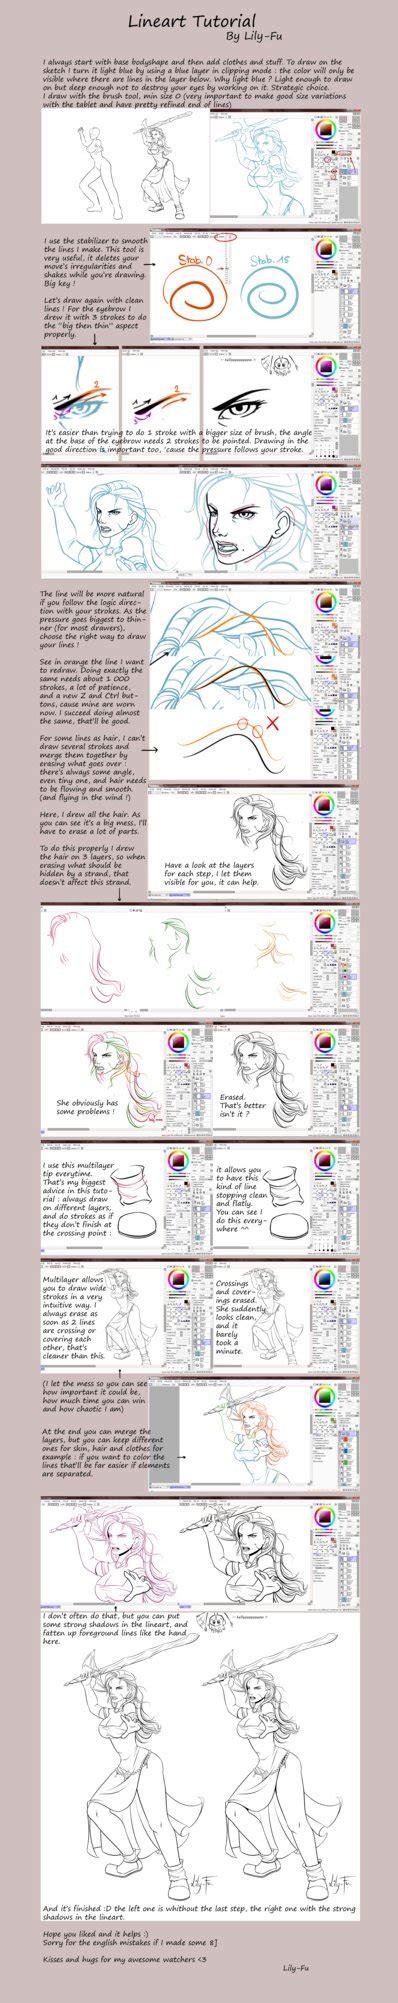 paint tool sai clipping tutorial paint tool sai on drawing tutorials deviantart